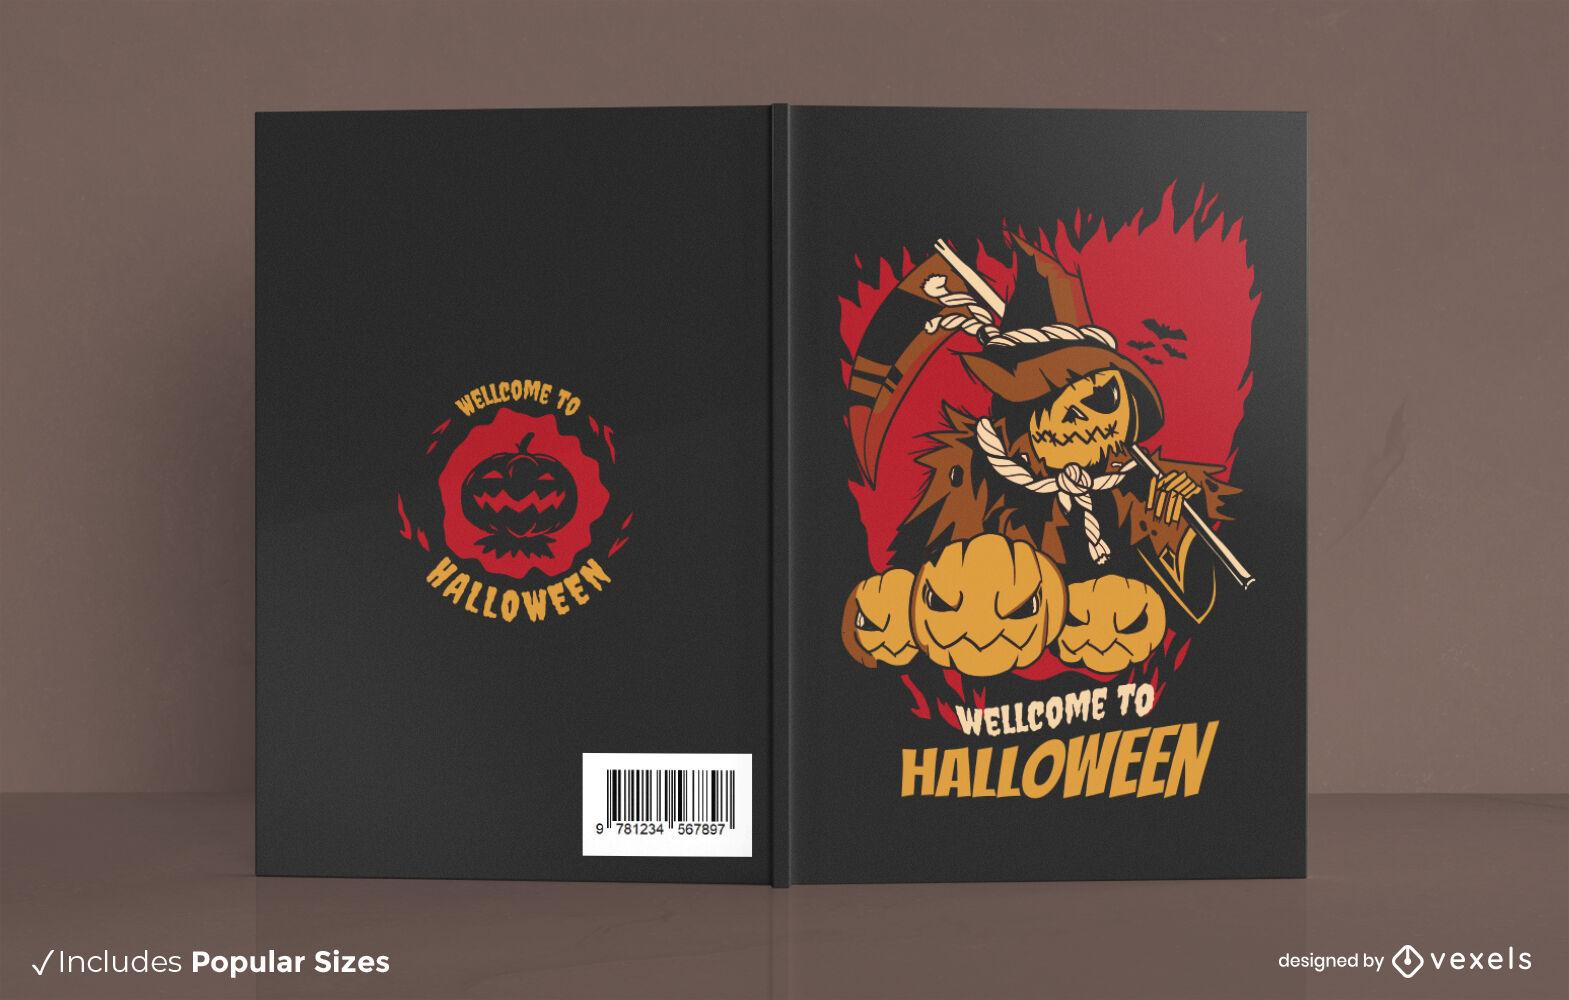 Jack o lantern halloween book cover design